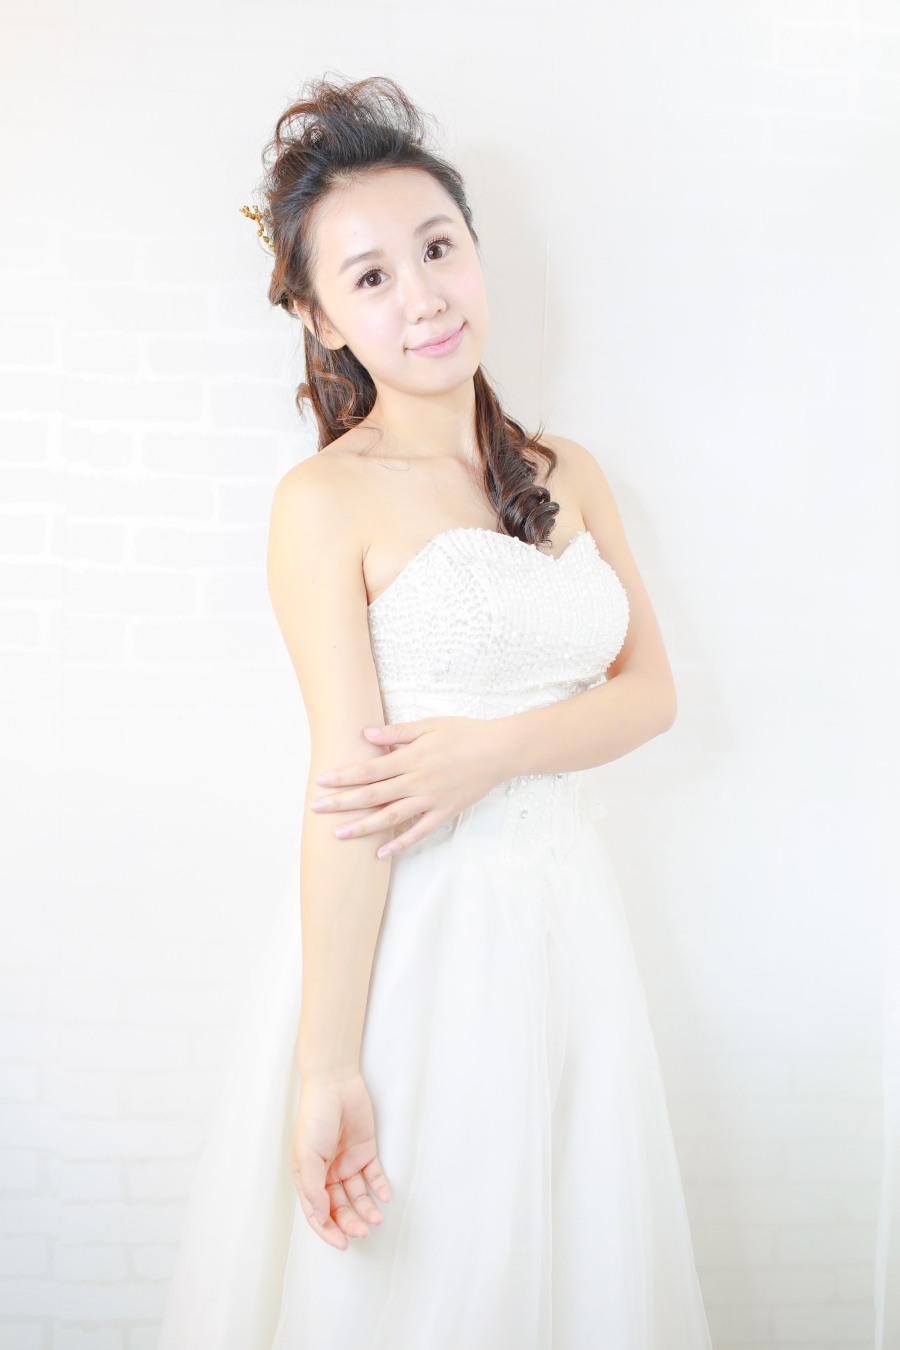 韓式新娘化妝髮型攝影_bridal_wedding_Korea_makeup_hairstyling_Top_MUA_paulstylist_photography_hk_stephanie-4